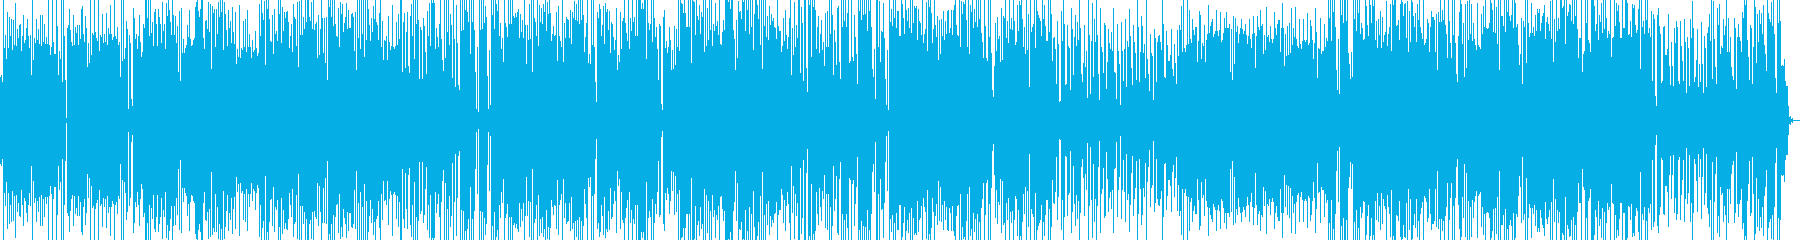 POPで可愛く明るいコミカルソング の再生済みの波形